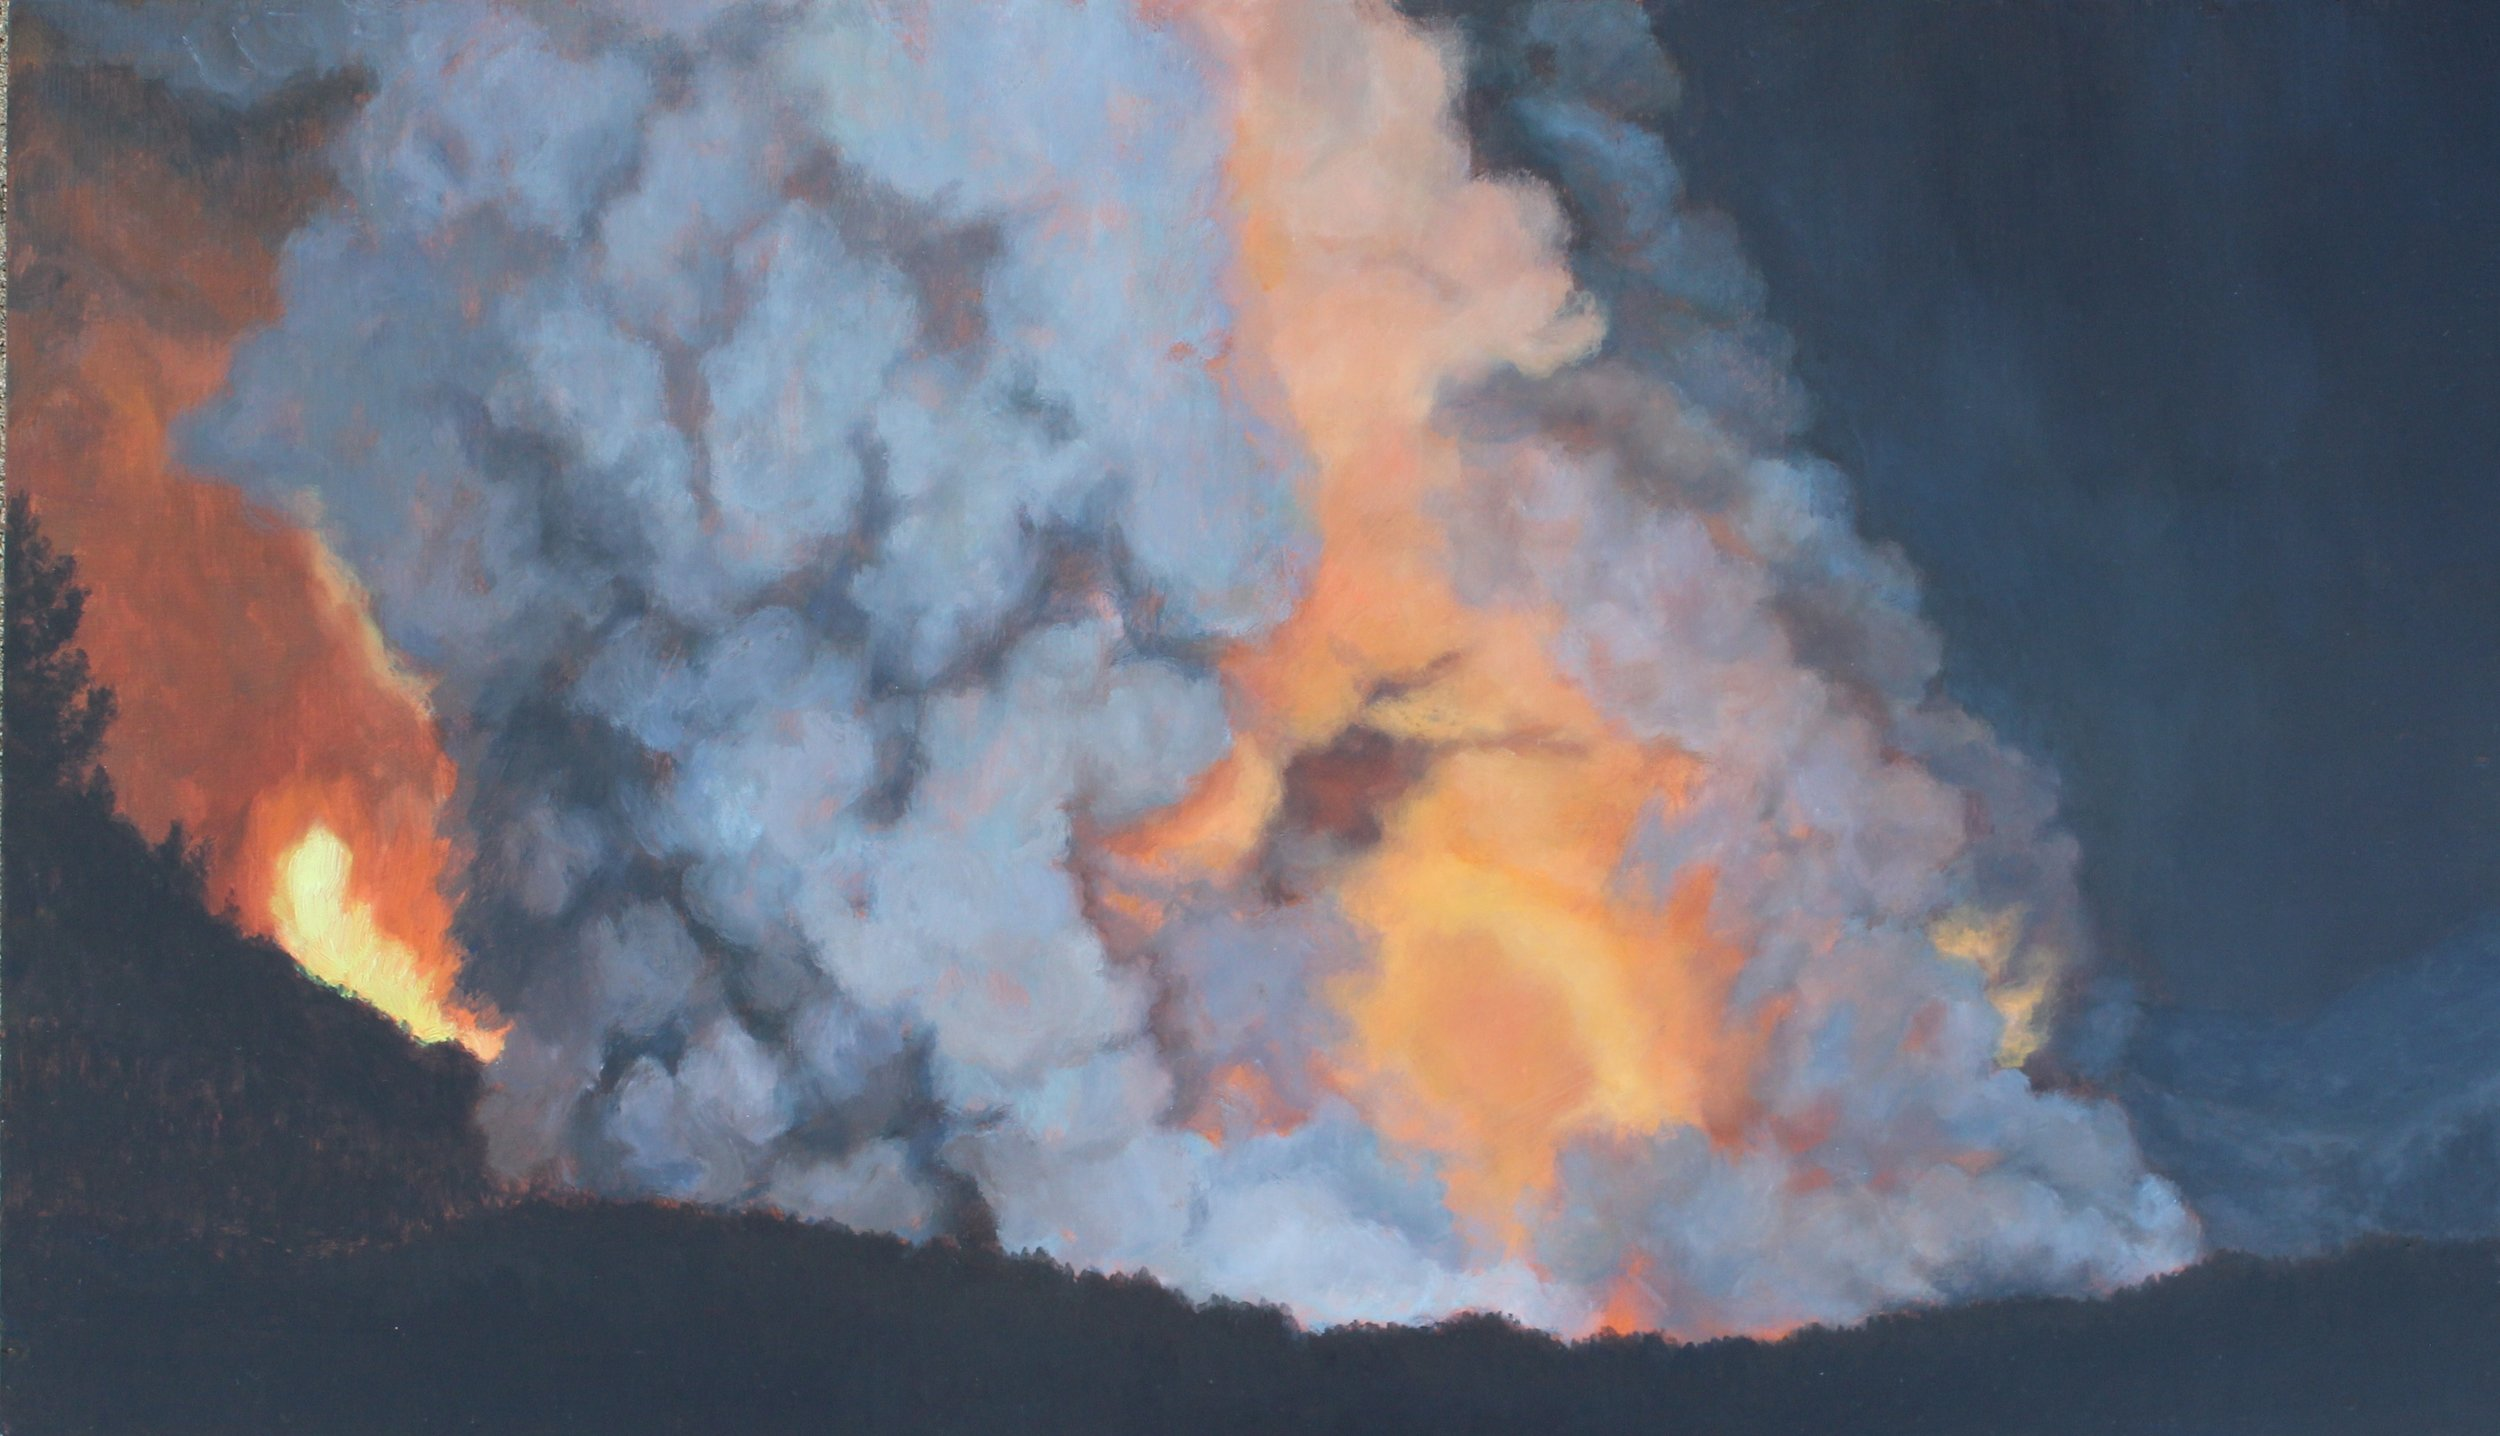 Sleepless Fire 2013 14x27''.JPG